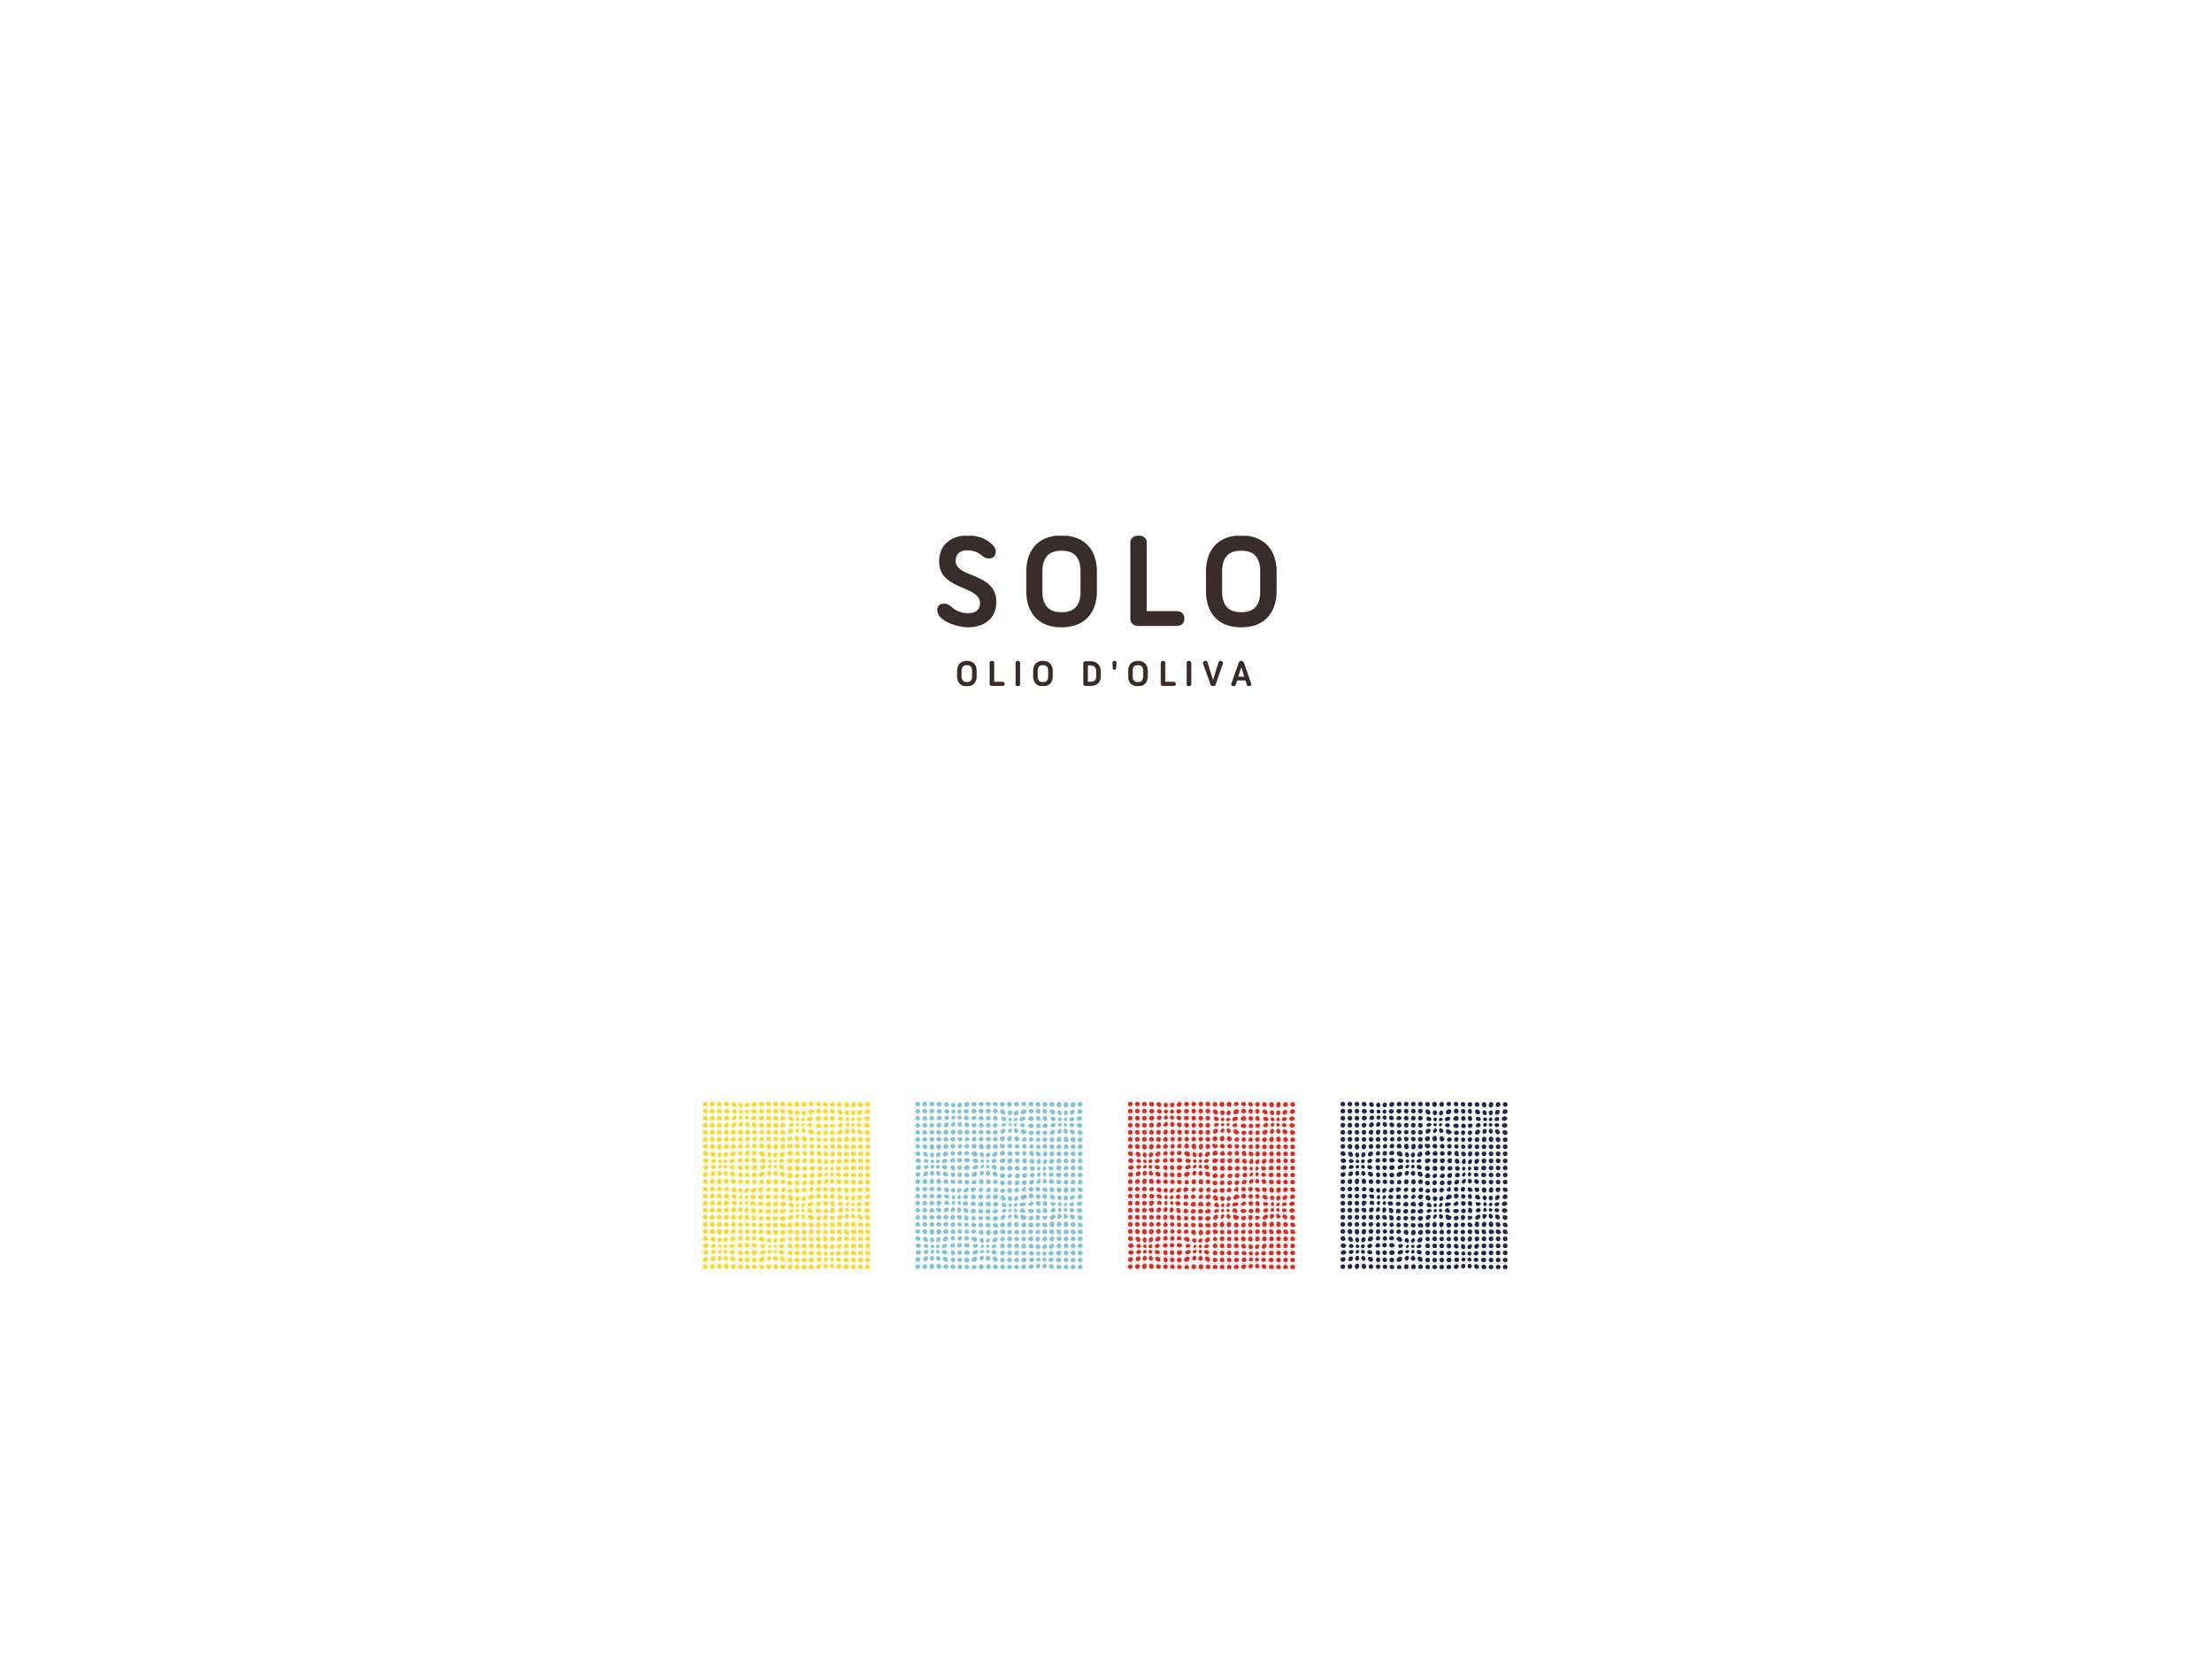 solo-olio-oliva-design-branding-packaging-label-logo-blockundstift-7